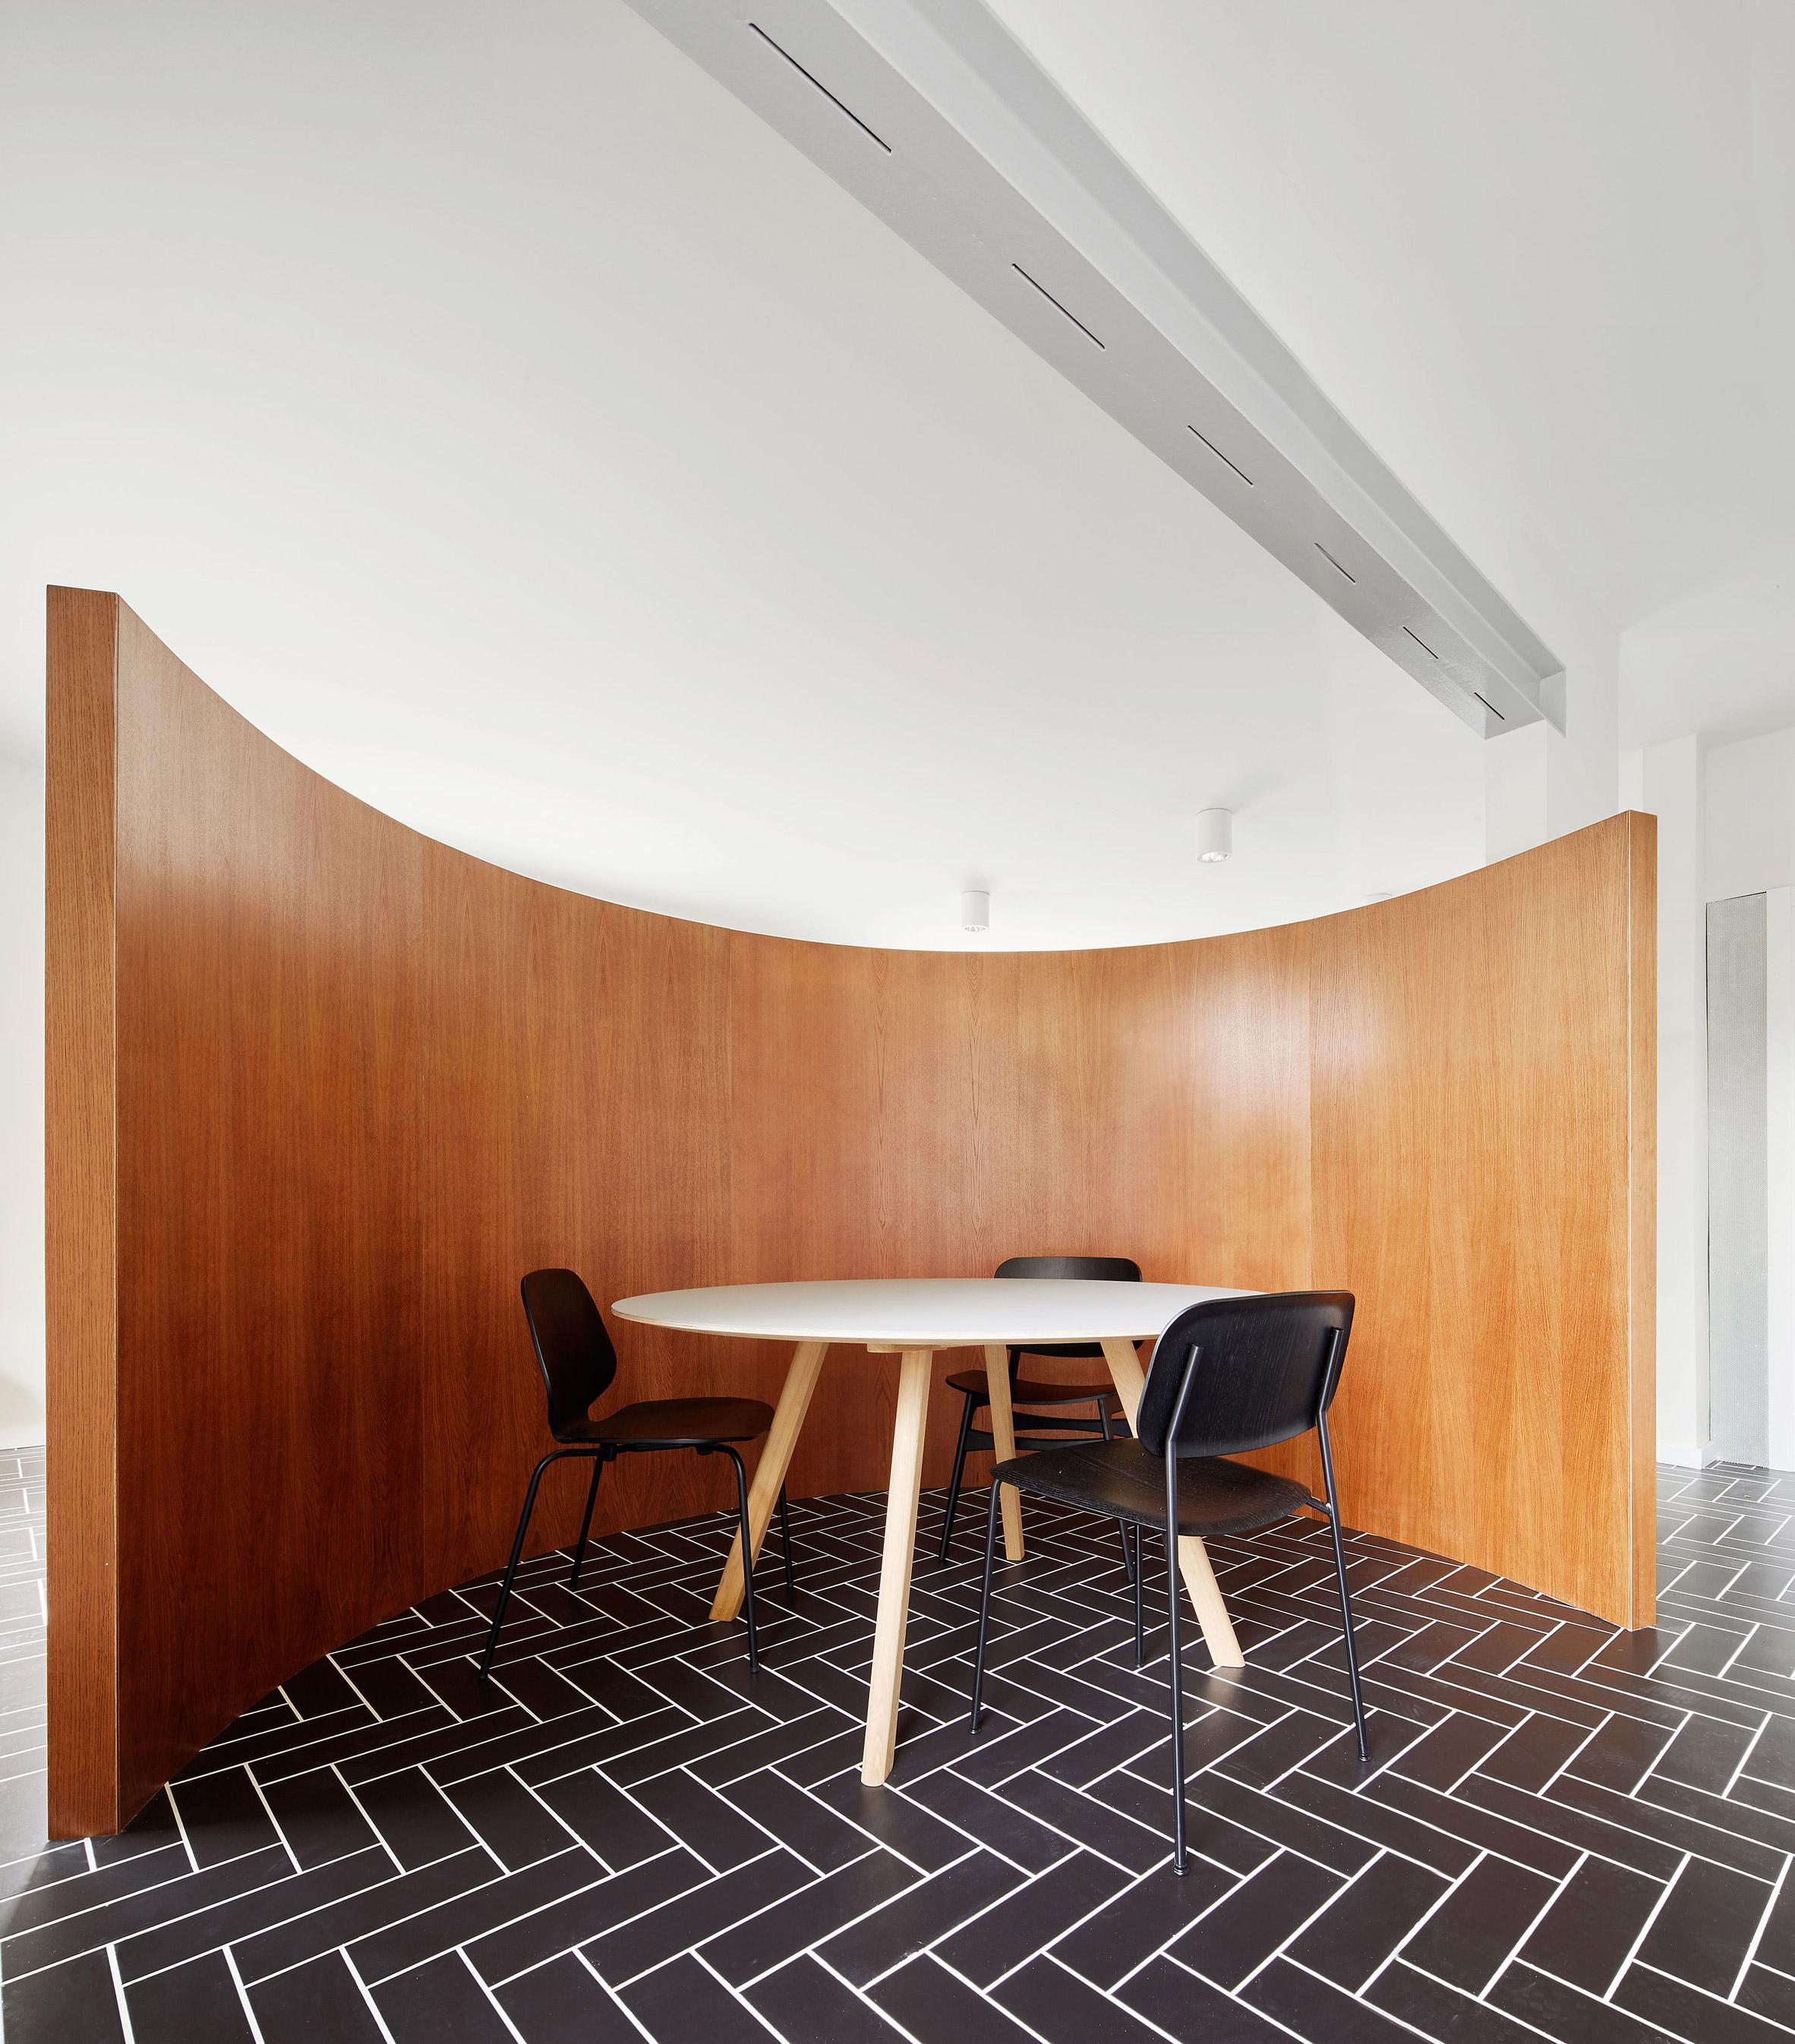 house-106-raul-sanchez-interiors_dezeen_2364_col_7